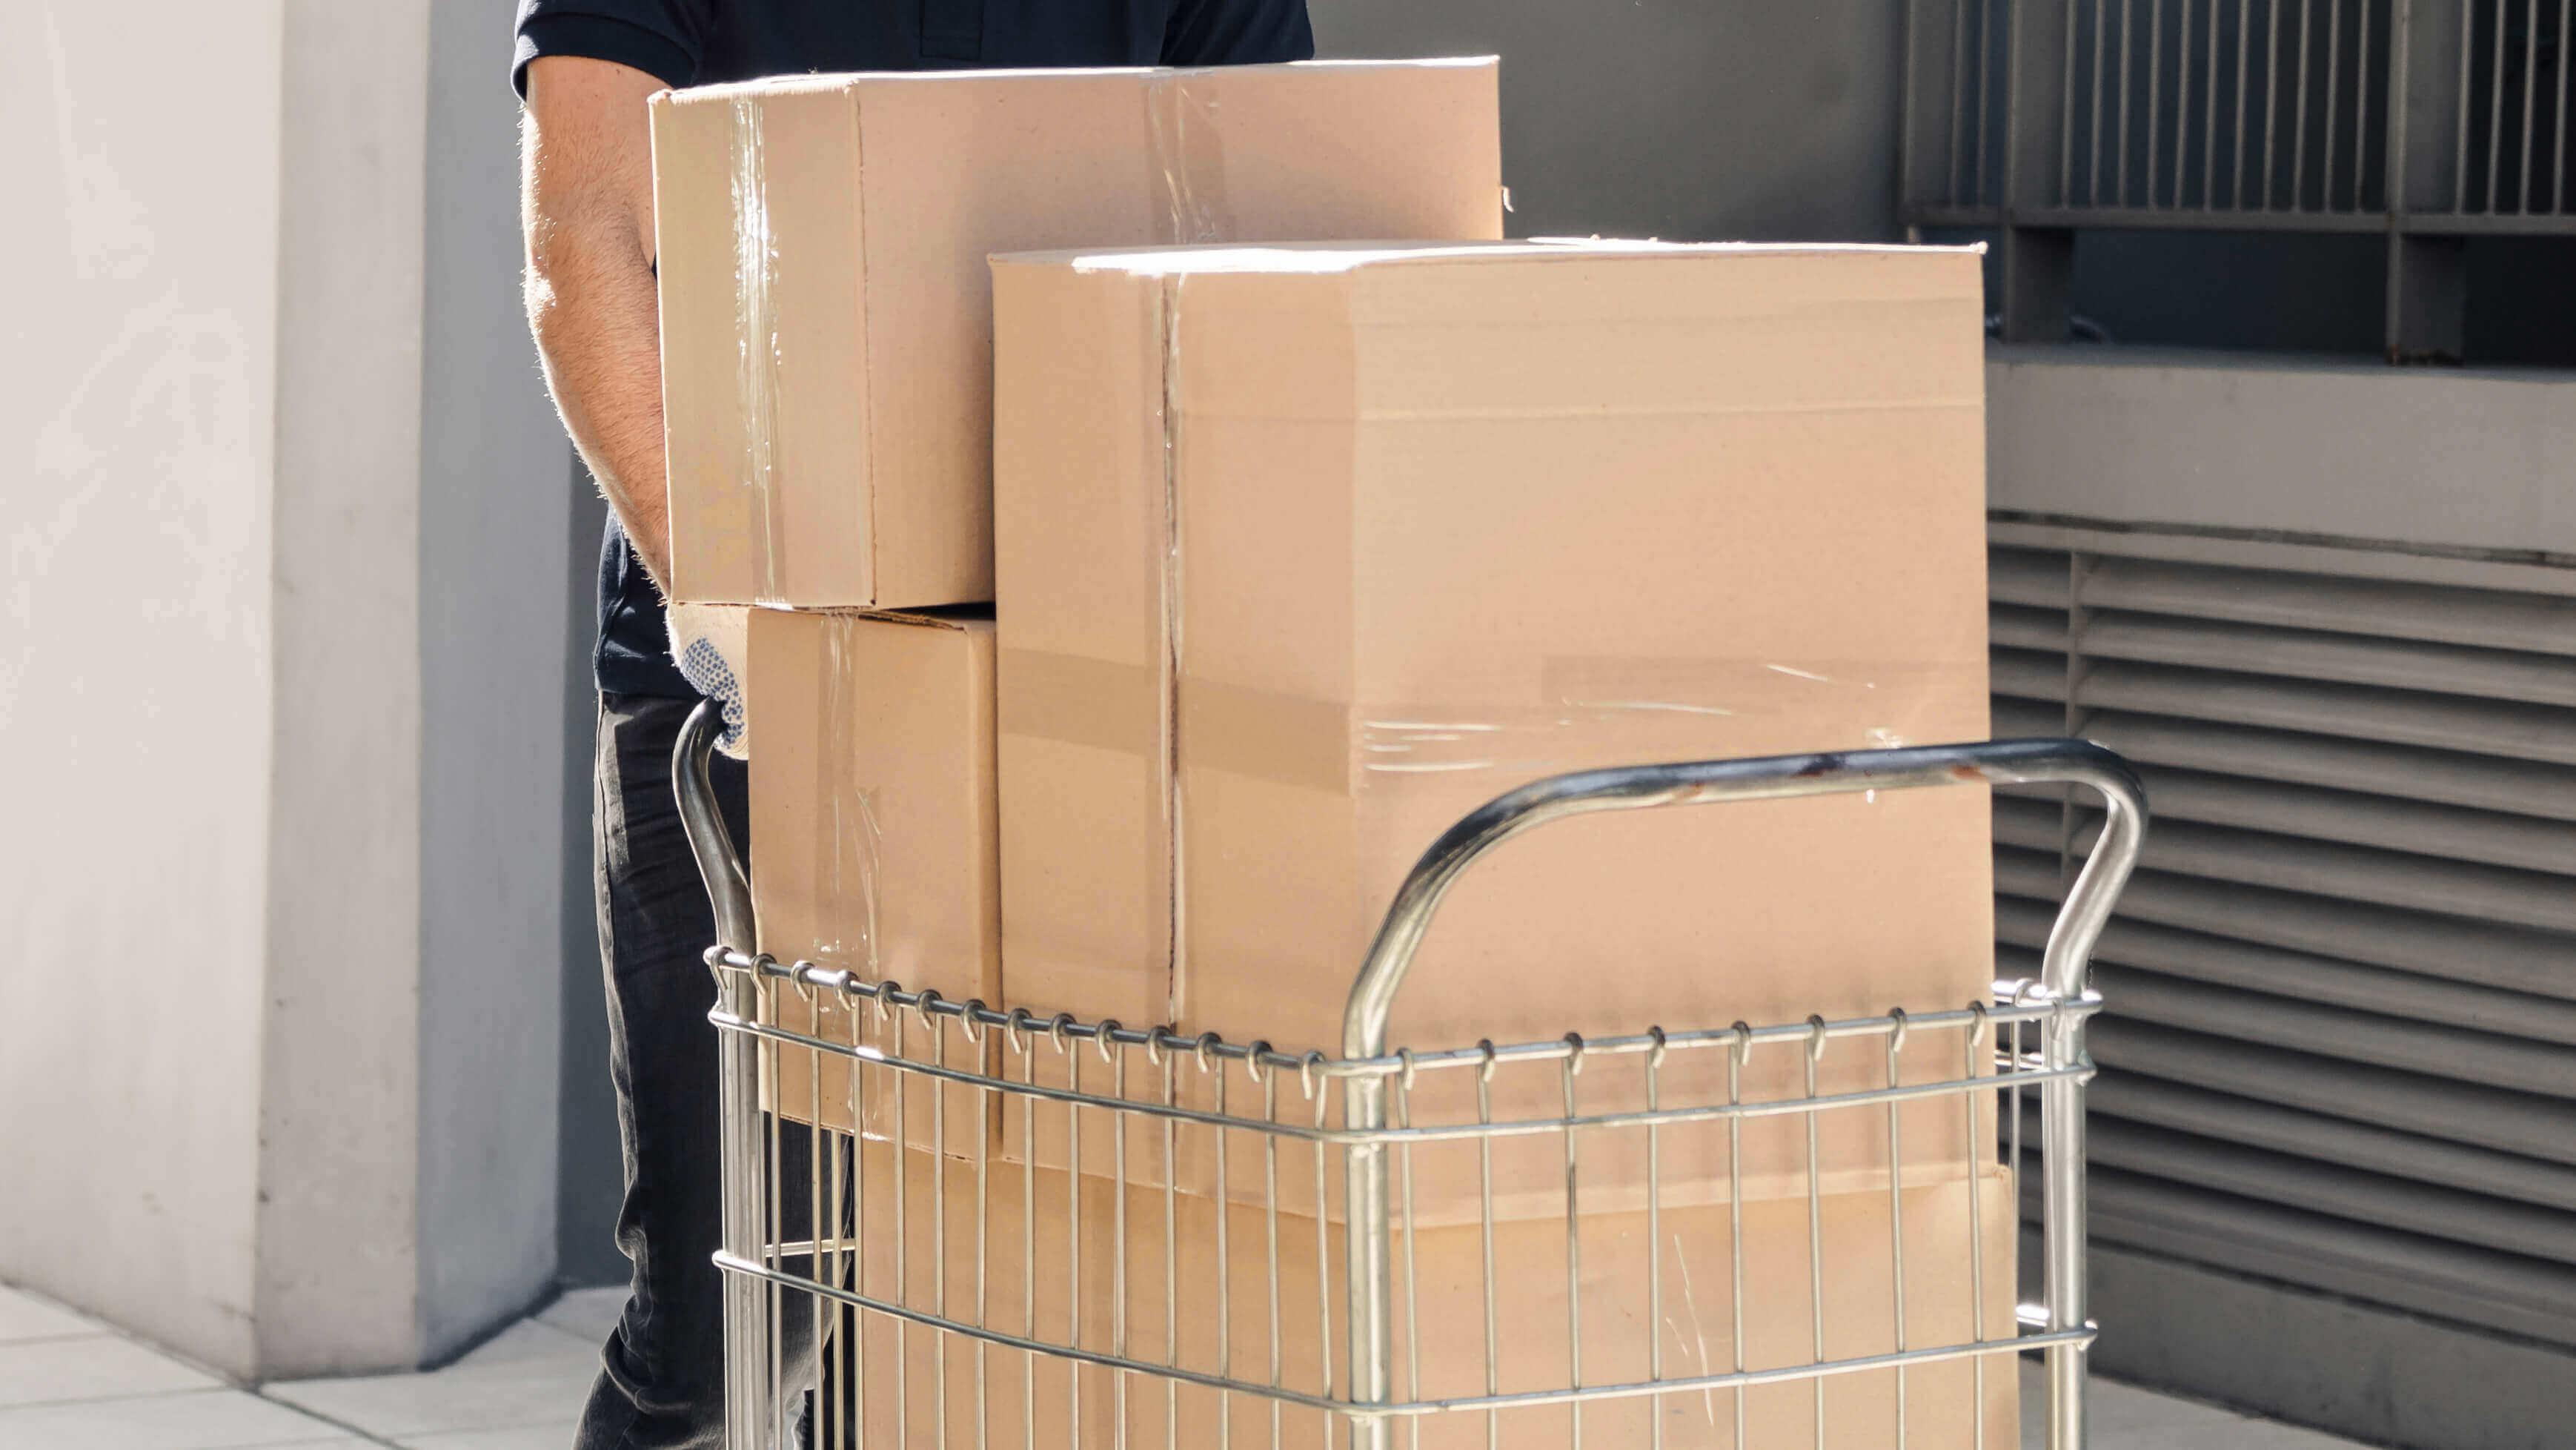 Intra logistics